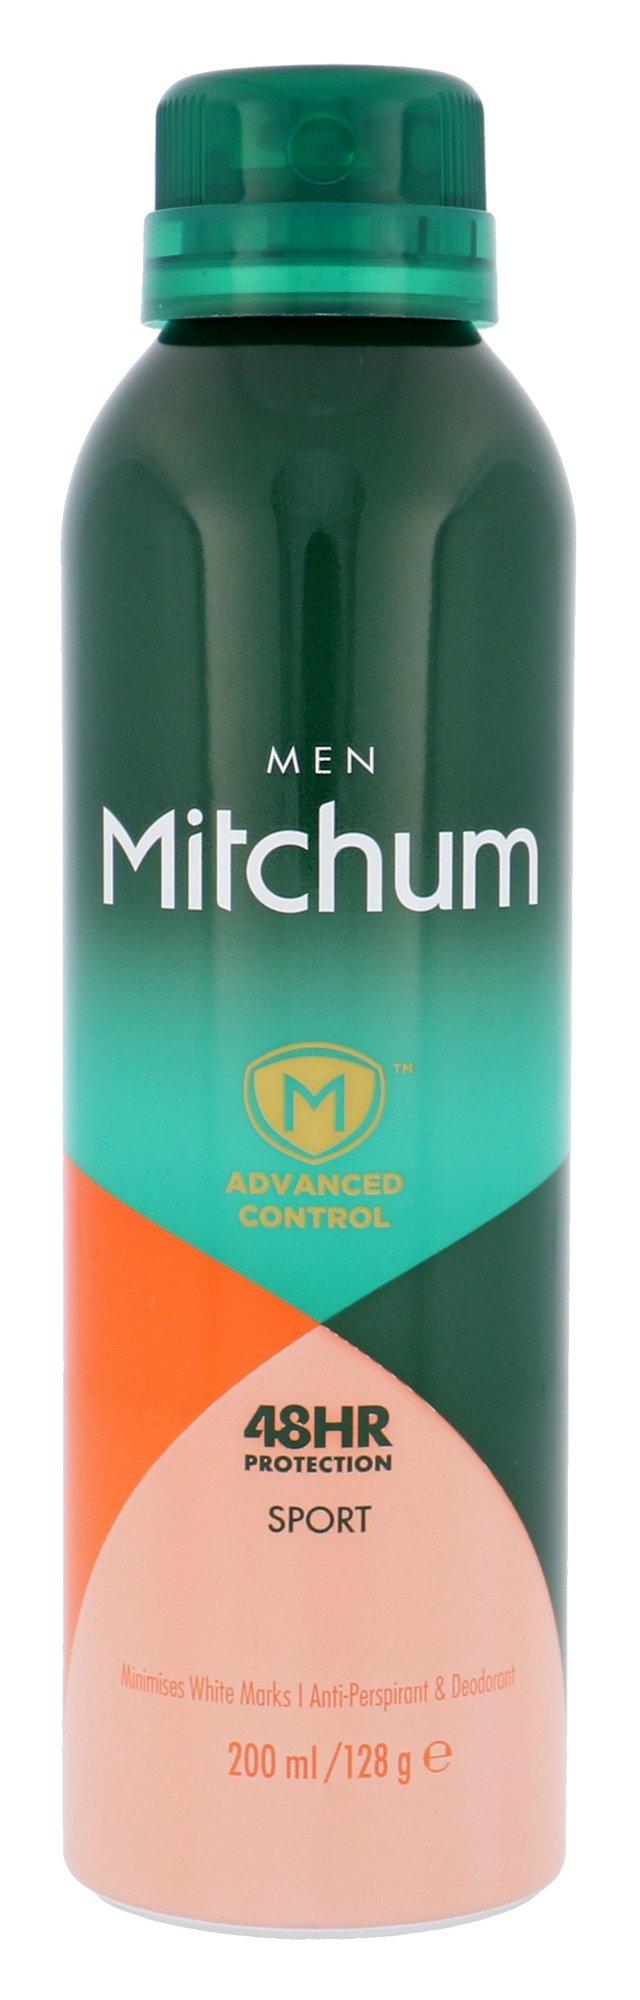 Mitchum Advanced Control Cosmetic 200ml  Sport